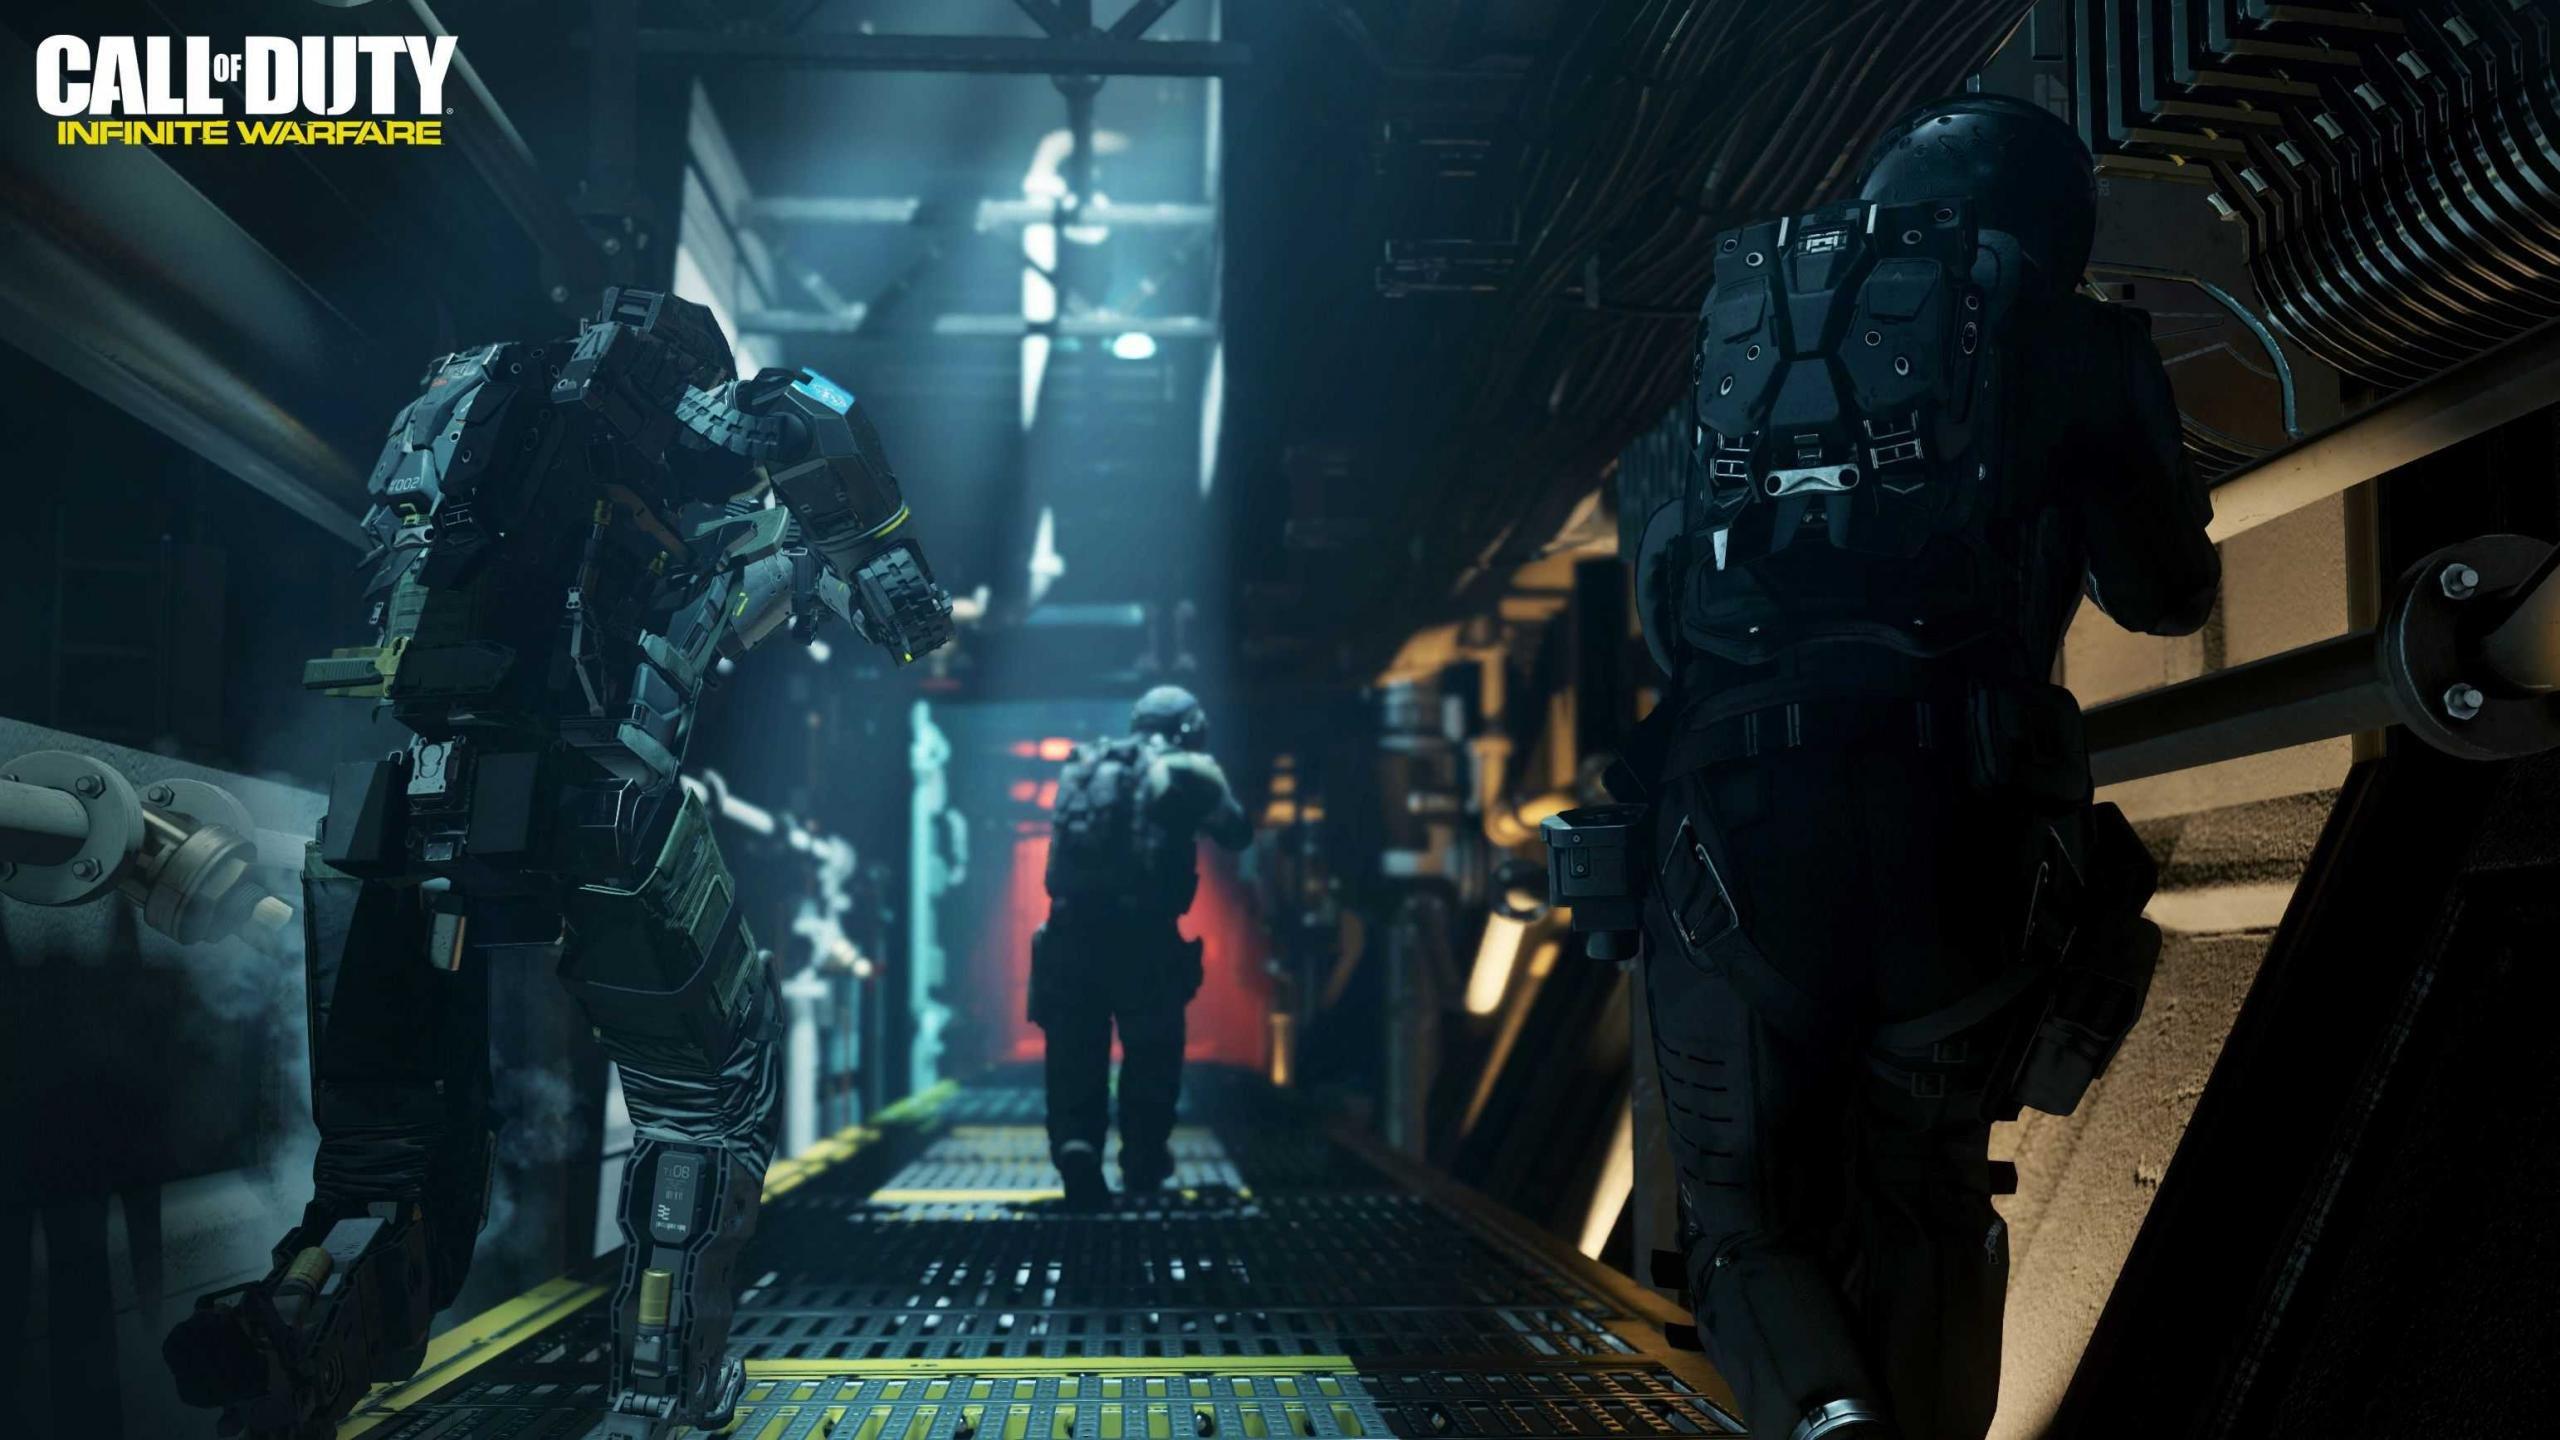 Cod Infinite Warfare Wallpaper: Call Of Duty (COD) Wallpapers 2560x1440 Desktop Backgrounds